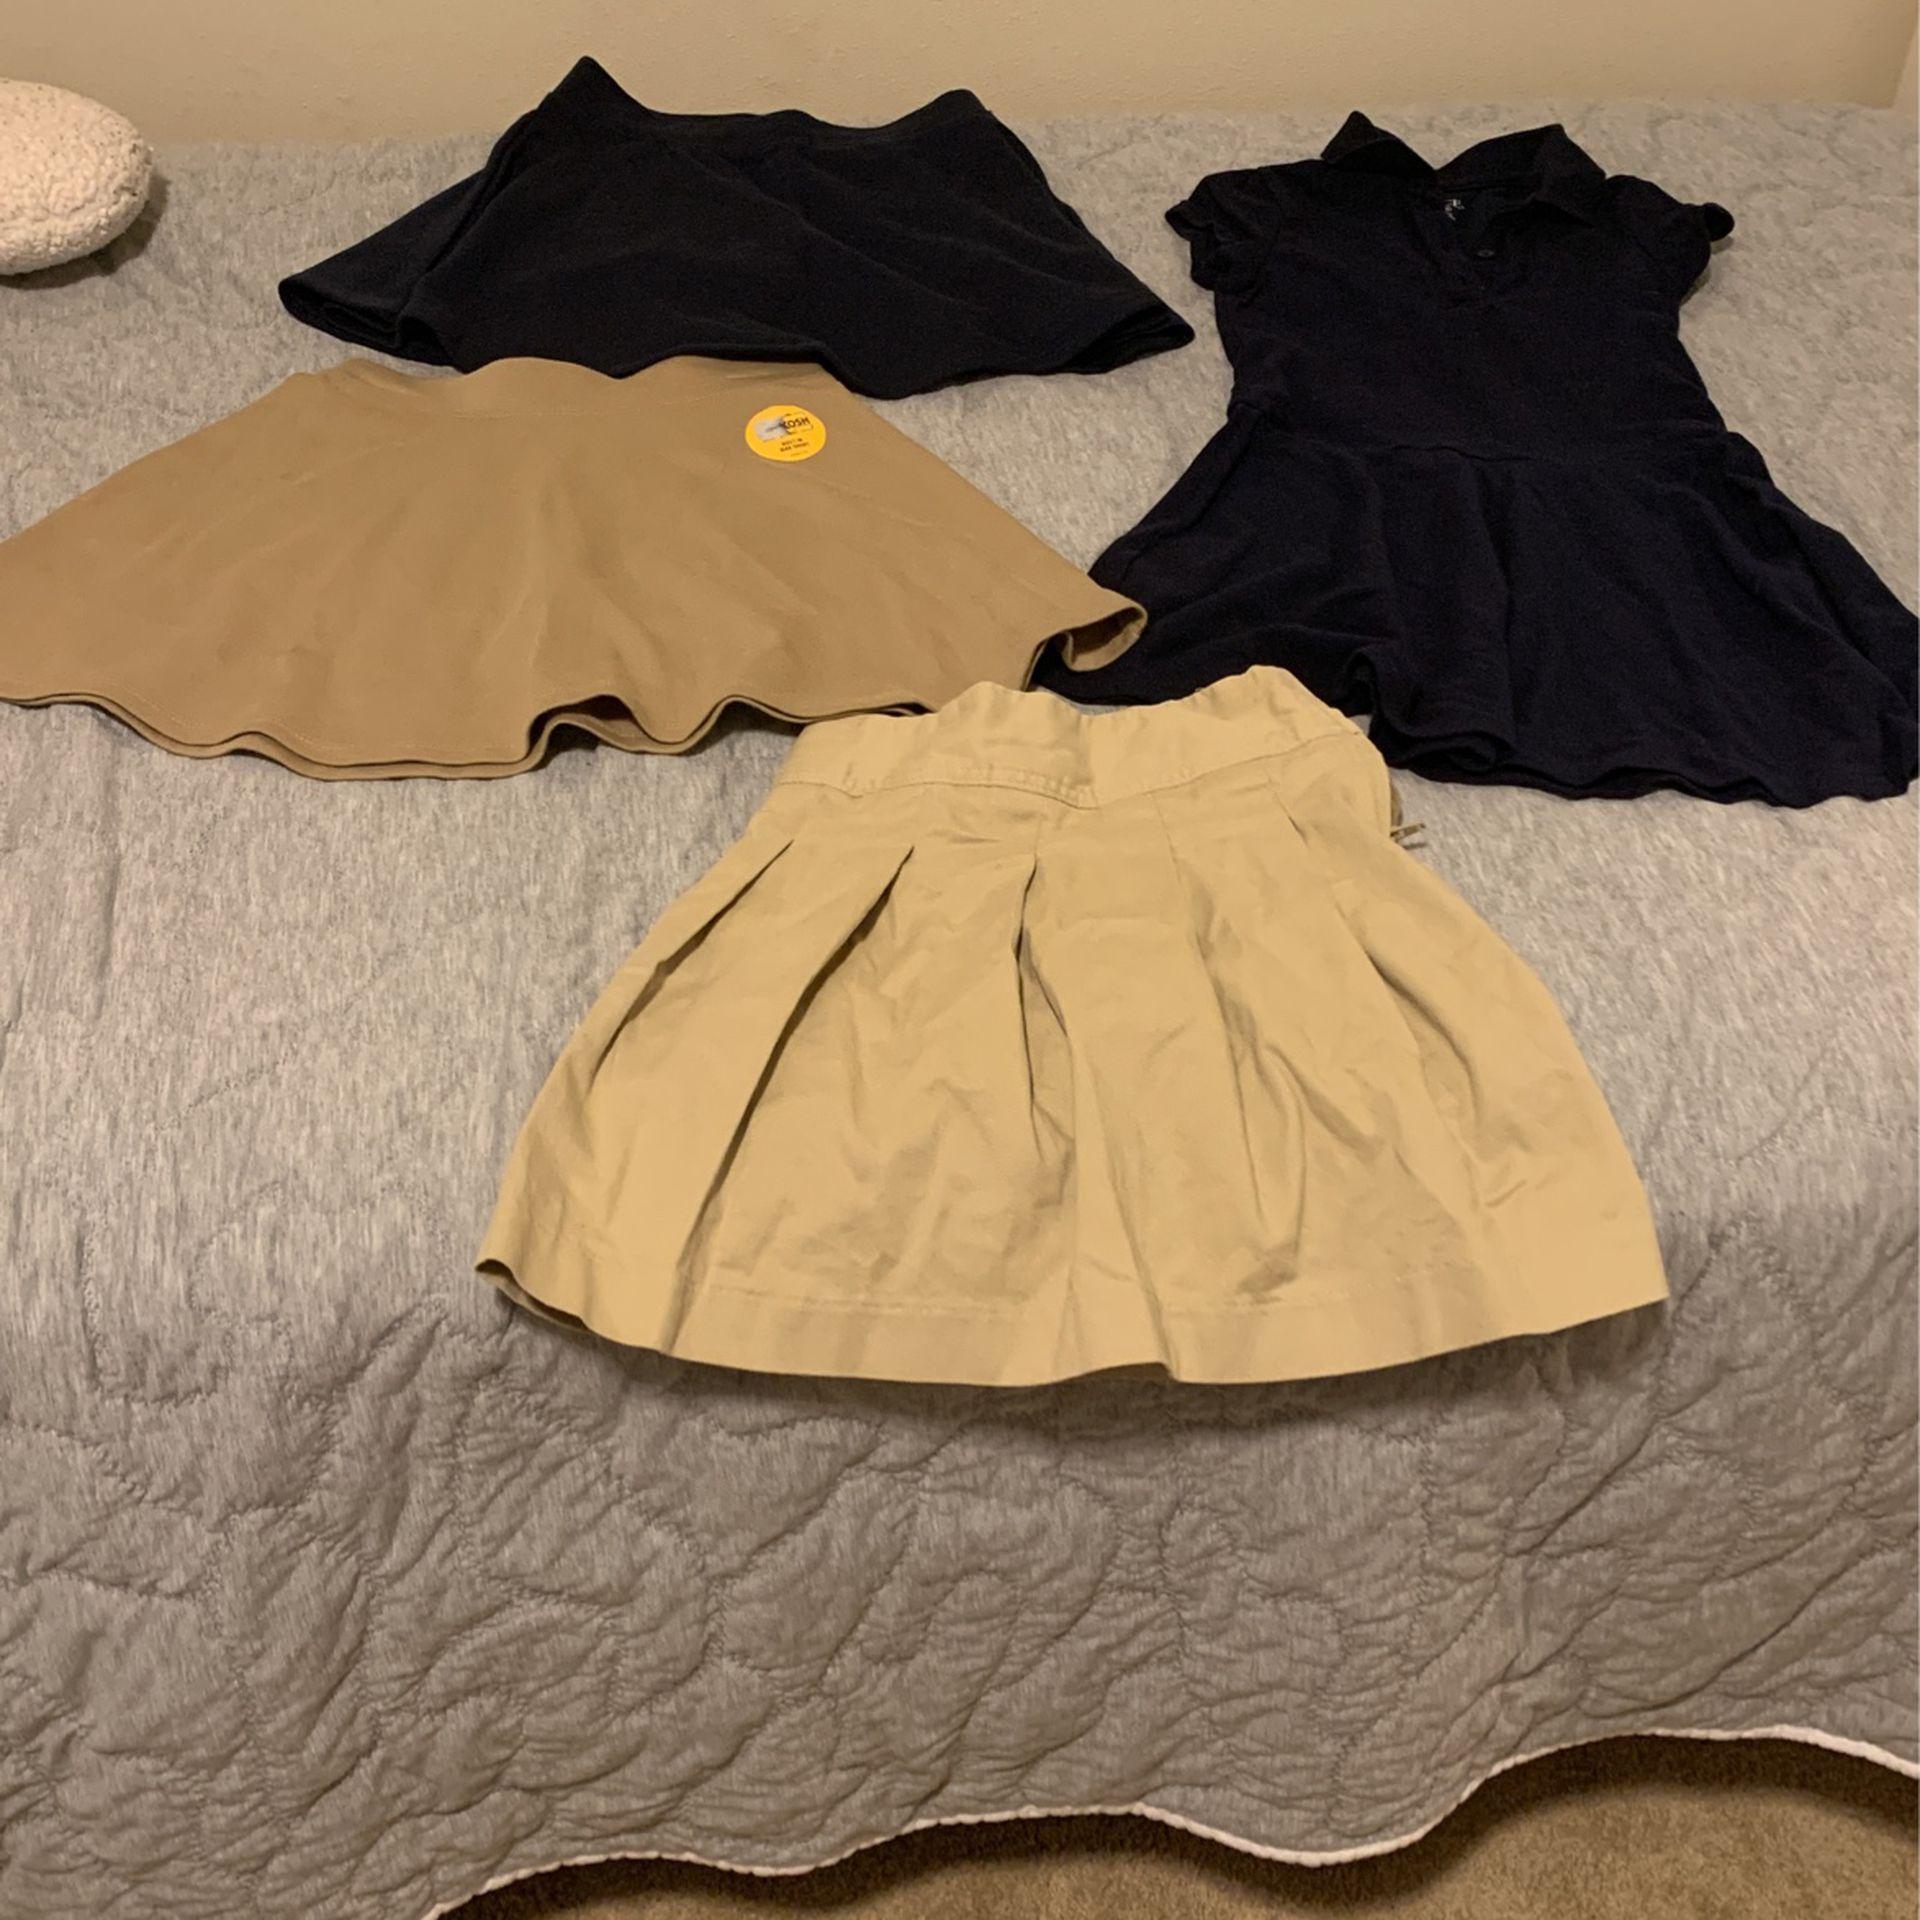 Brand new - Never Worn School Uniform Items Girl